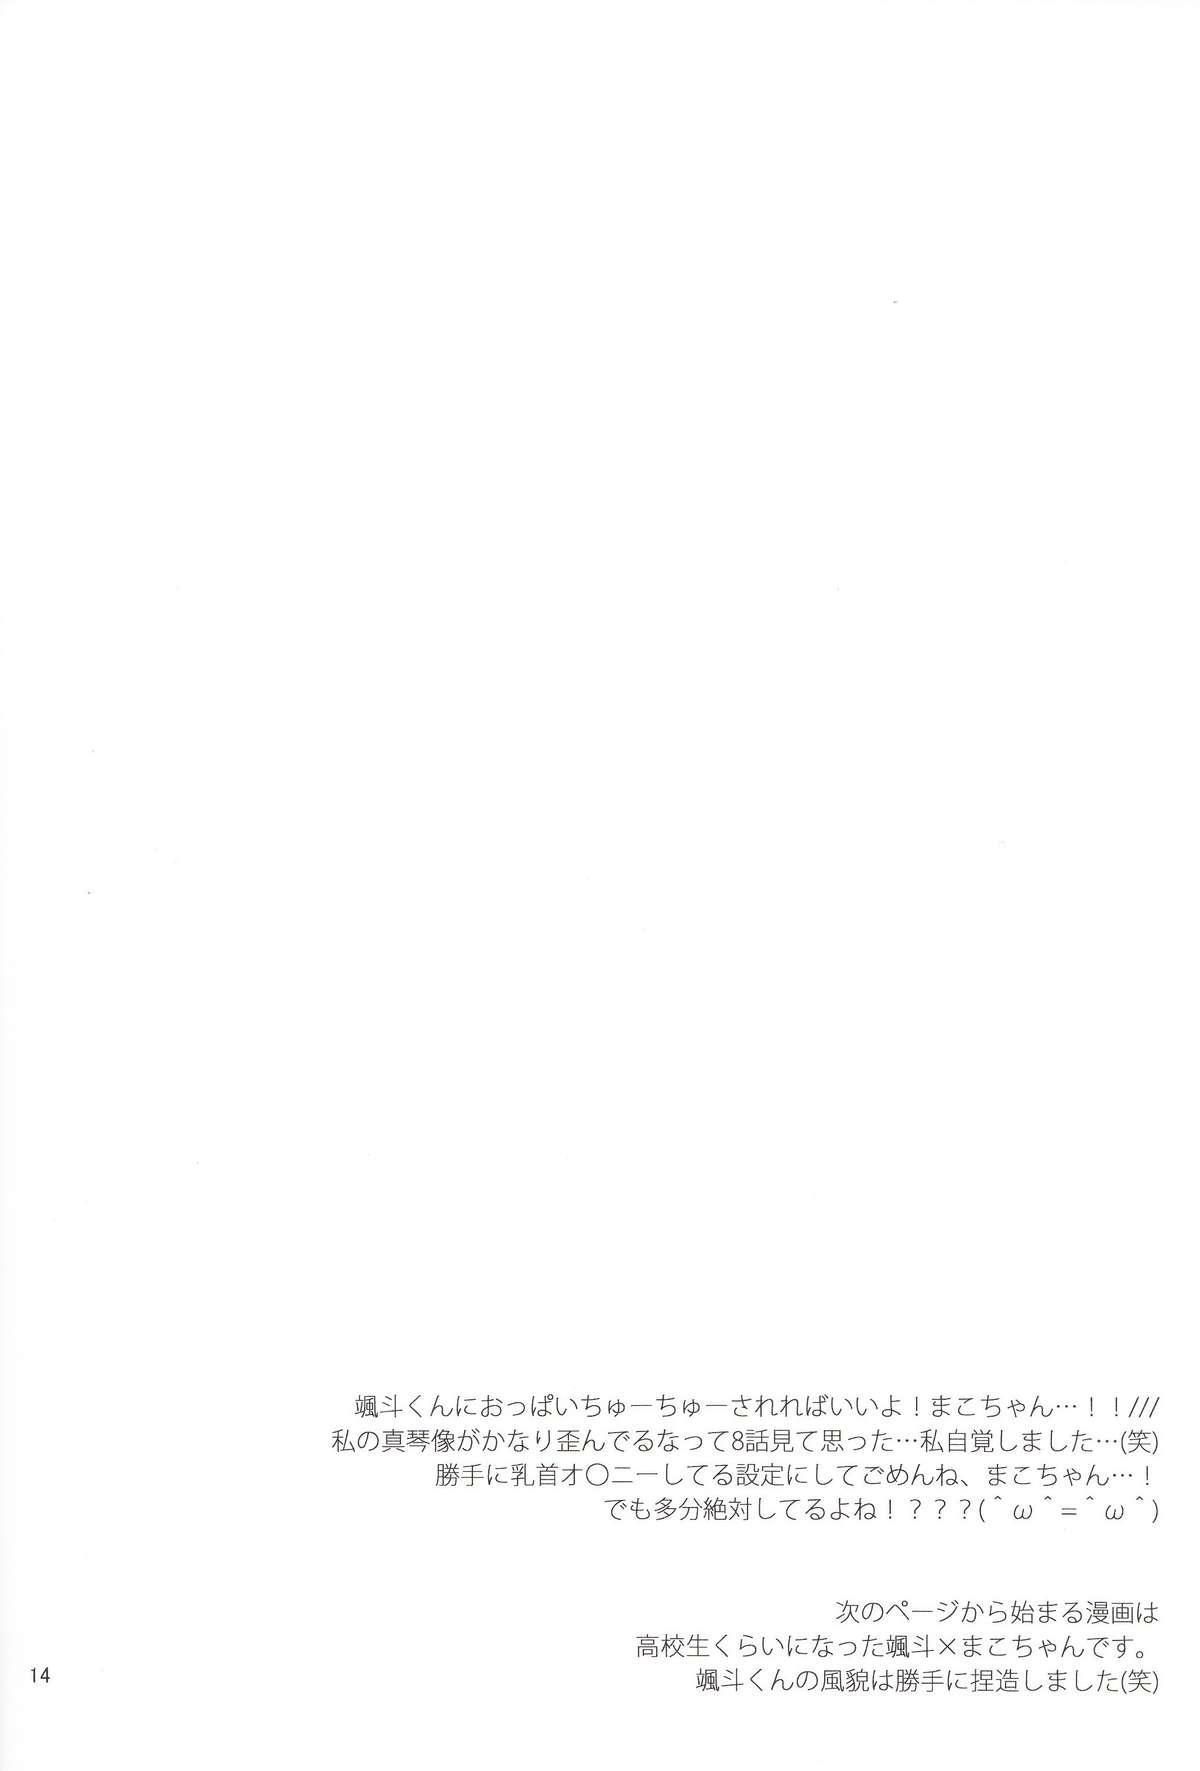 Tachibana Coach no Kojin Lesson 12